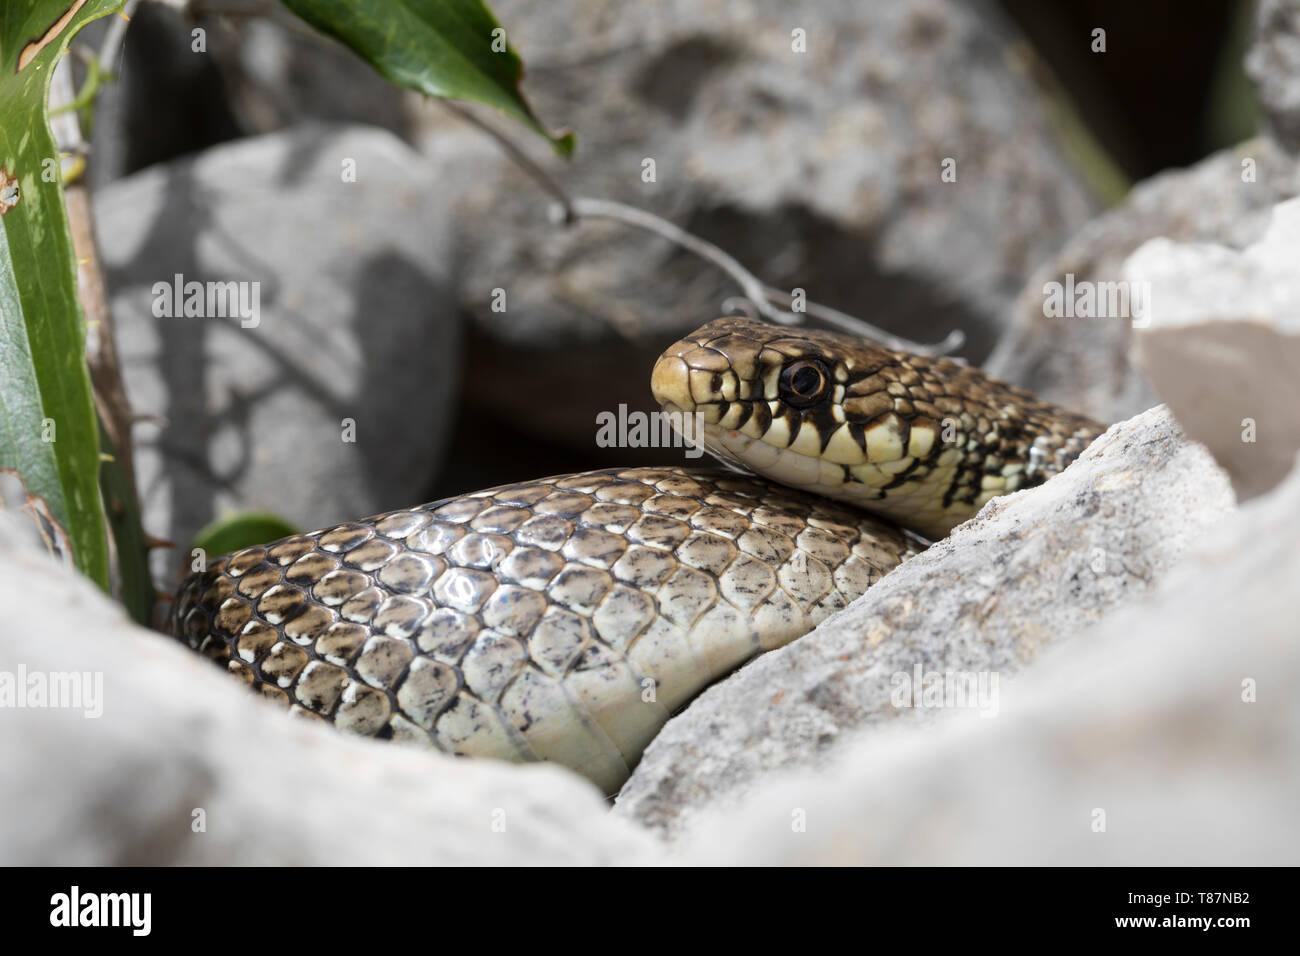 Balkan-Zornnatter, Balkanzornnatter, Zornnatter, Hierophis gemonensis, Coluber gemonensis, Balkan whip snake, couleuvre des Balkans - Stock Image